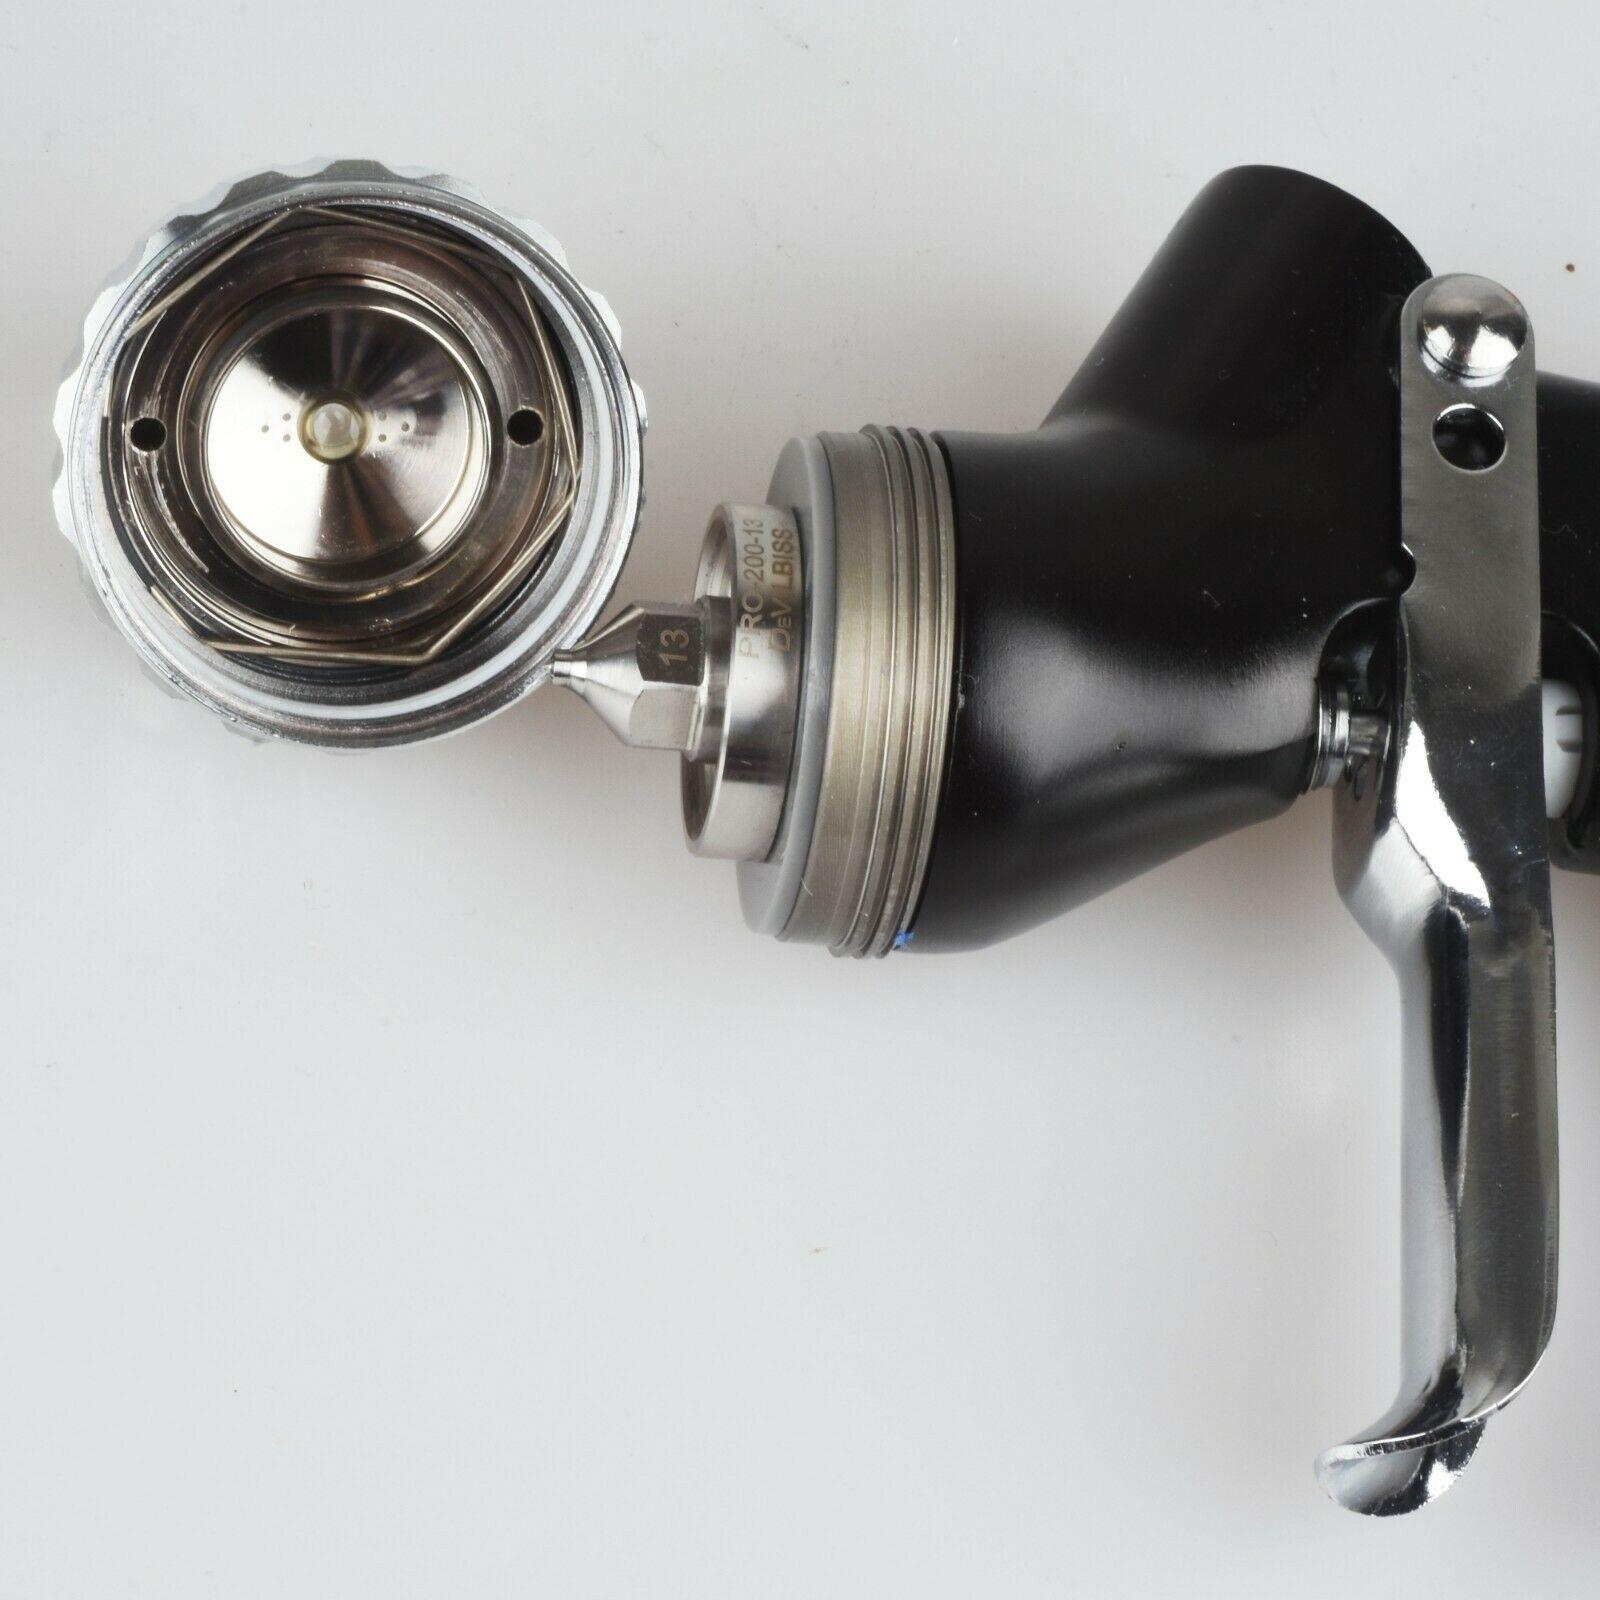 Tools : New pneumatic gun Sprayer GTI PRO LITE 1 3 1 4 nozzle w t Tank Car Paint gun Tool Pistol Spray Gun environmental protection